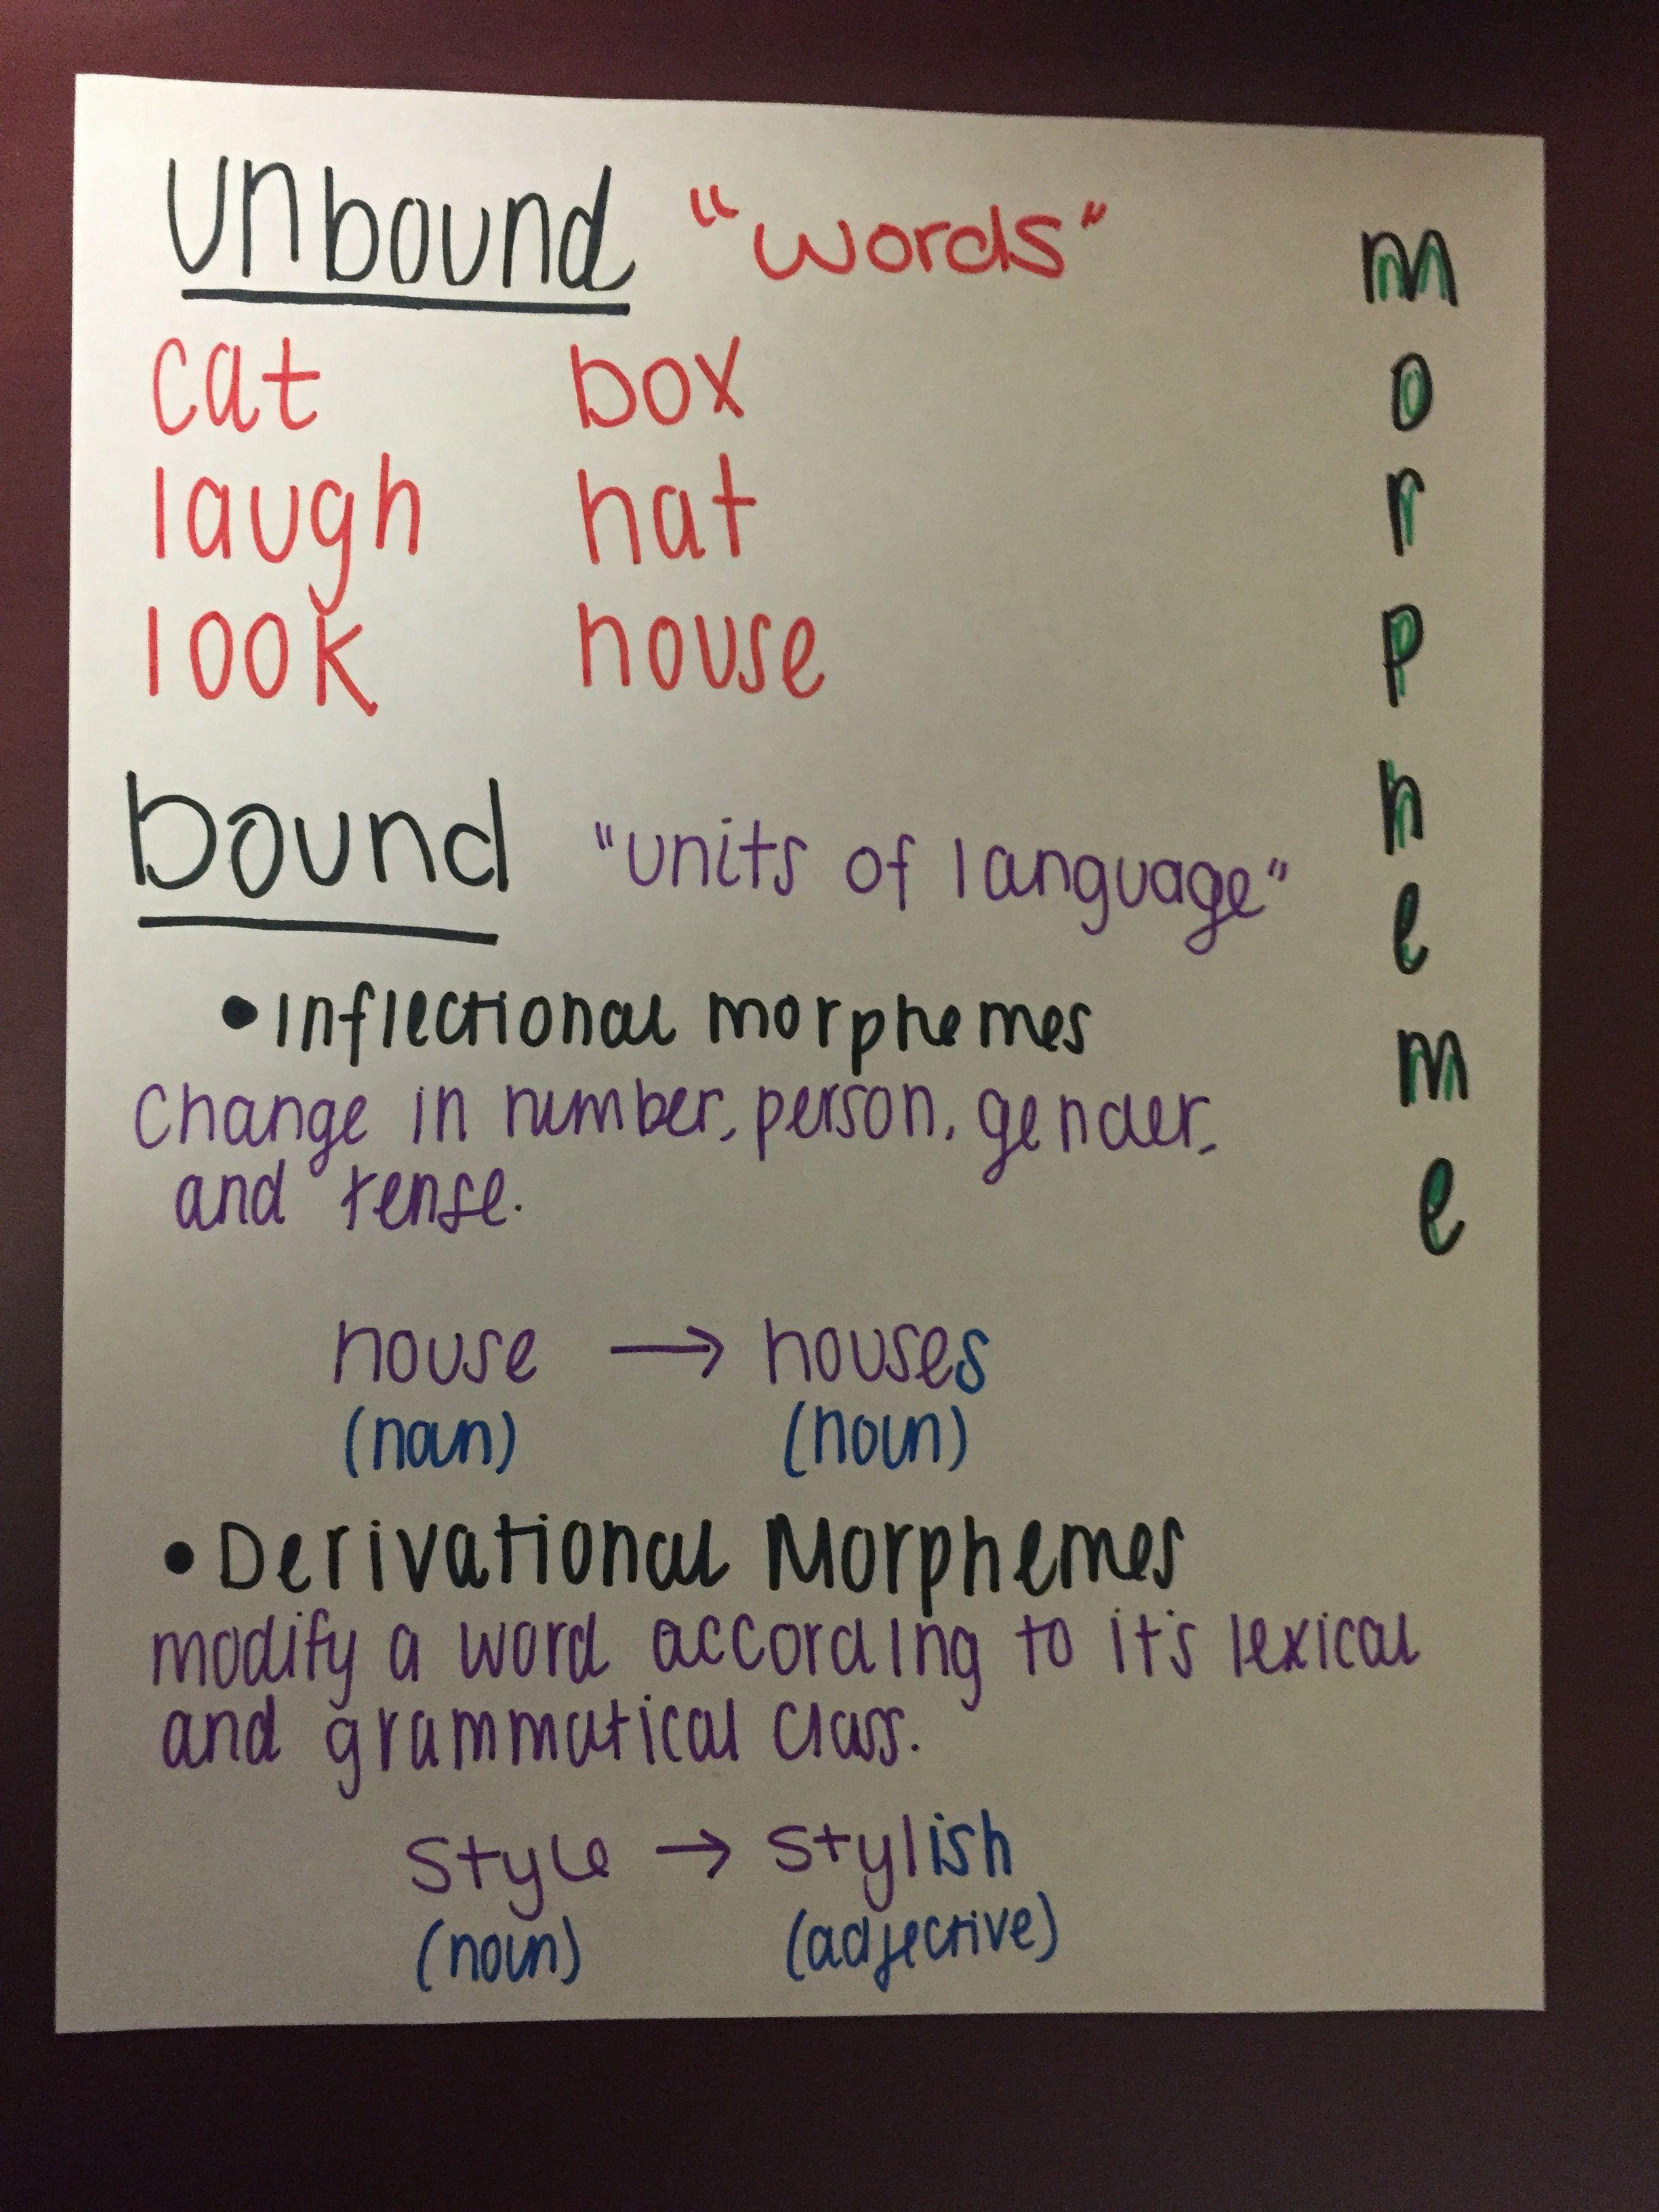 Morphology: bound and unbound morphemes  Unbound- words Bound- units